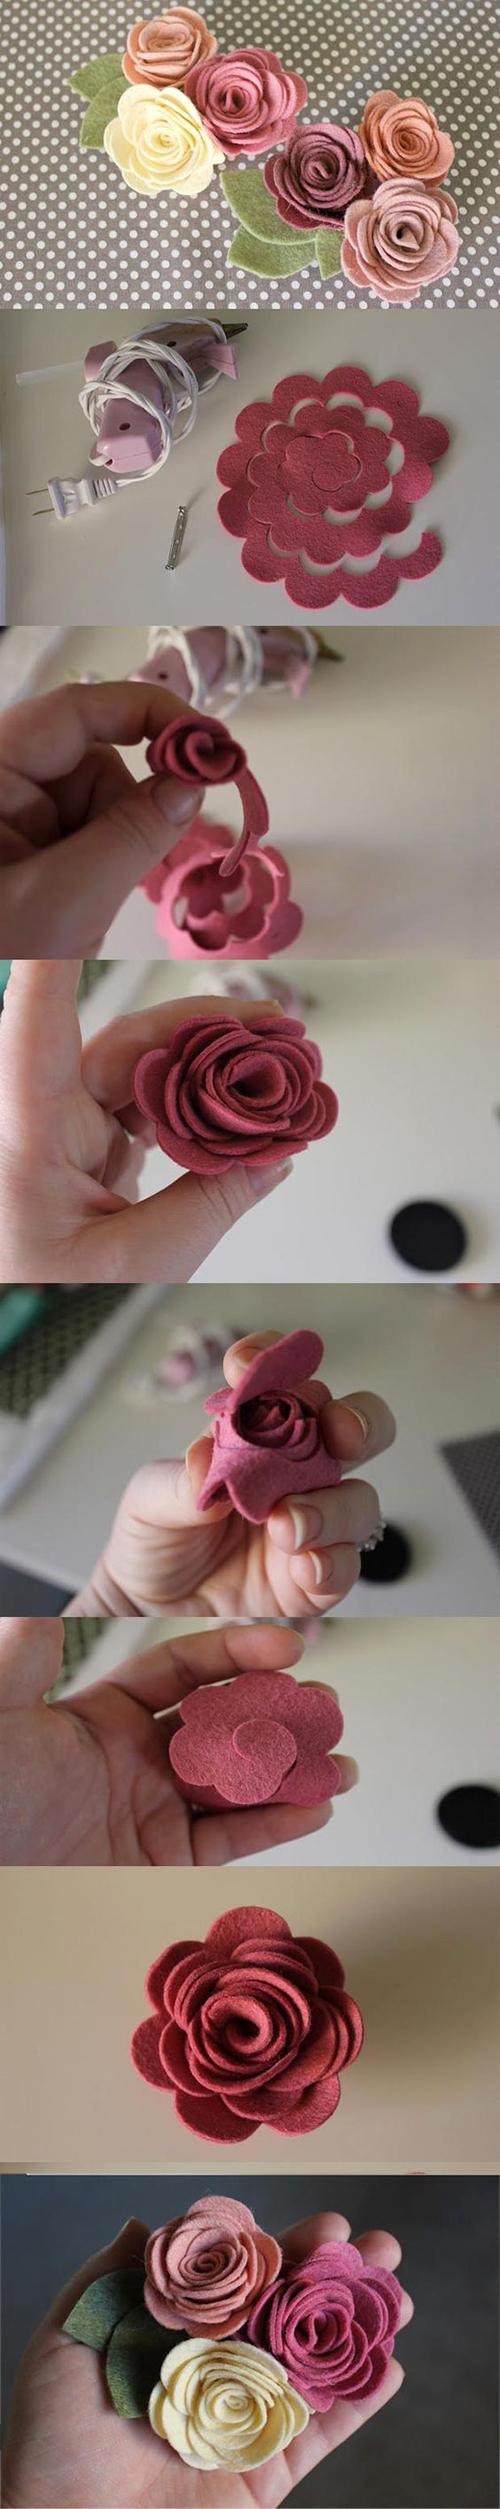 роза из фетра своими руками